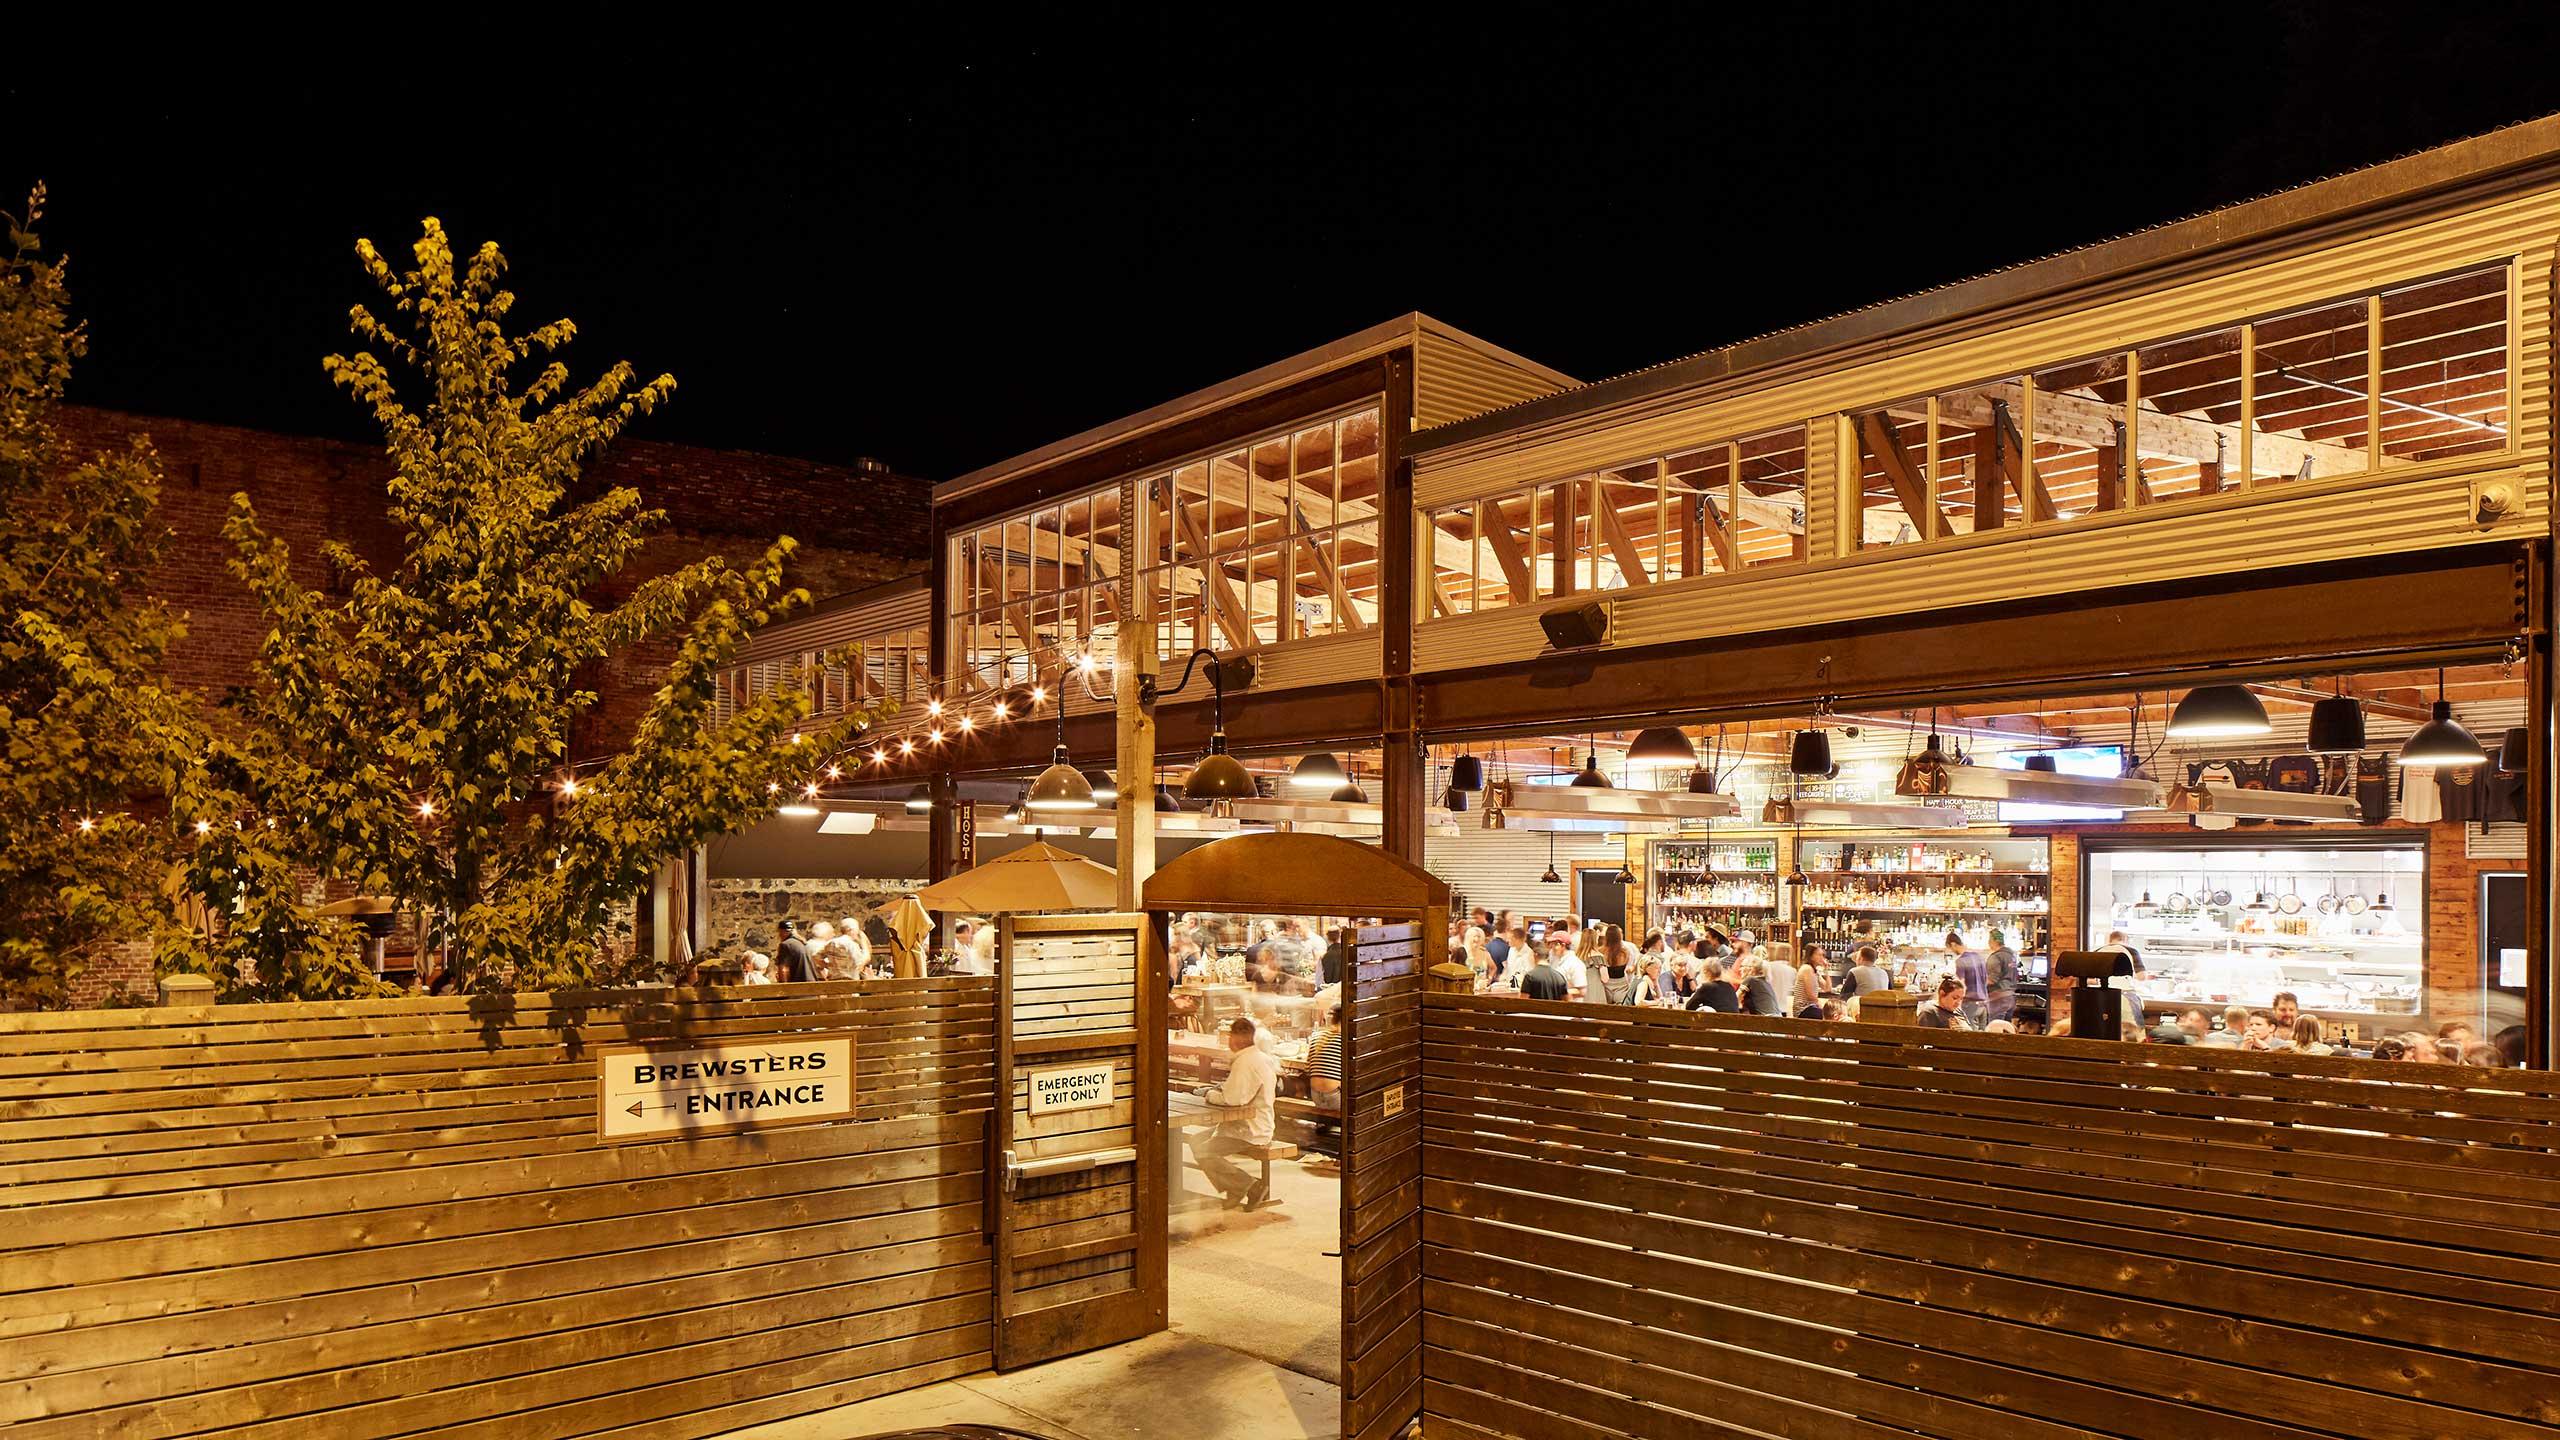 Petaluma-Restaurant-Design-Brewsters-contemporary-Roof-structure